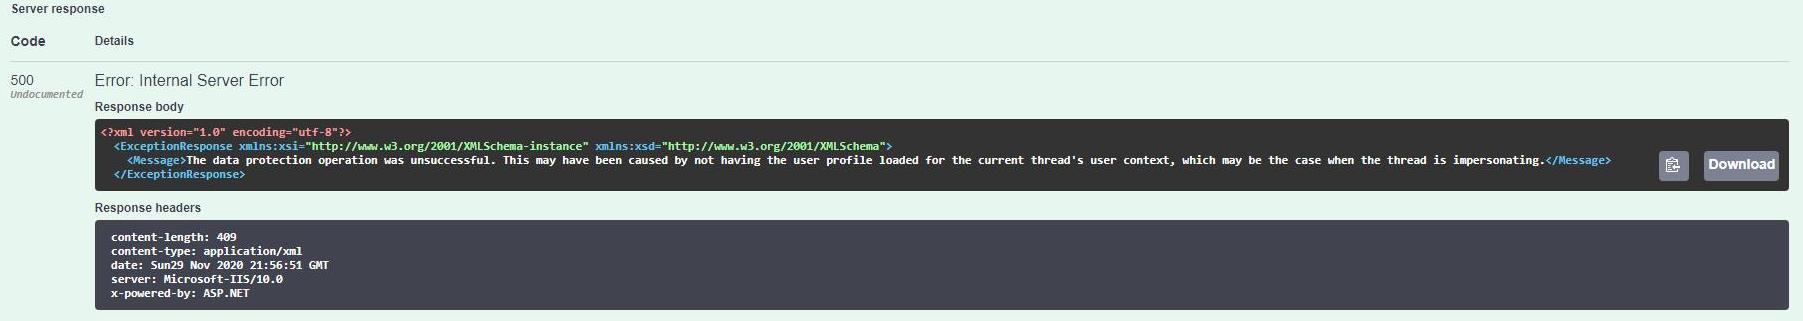 Data Protection error